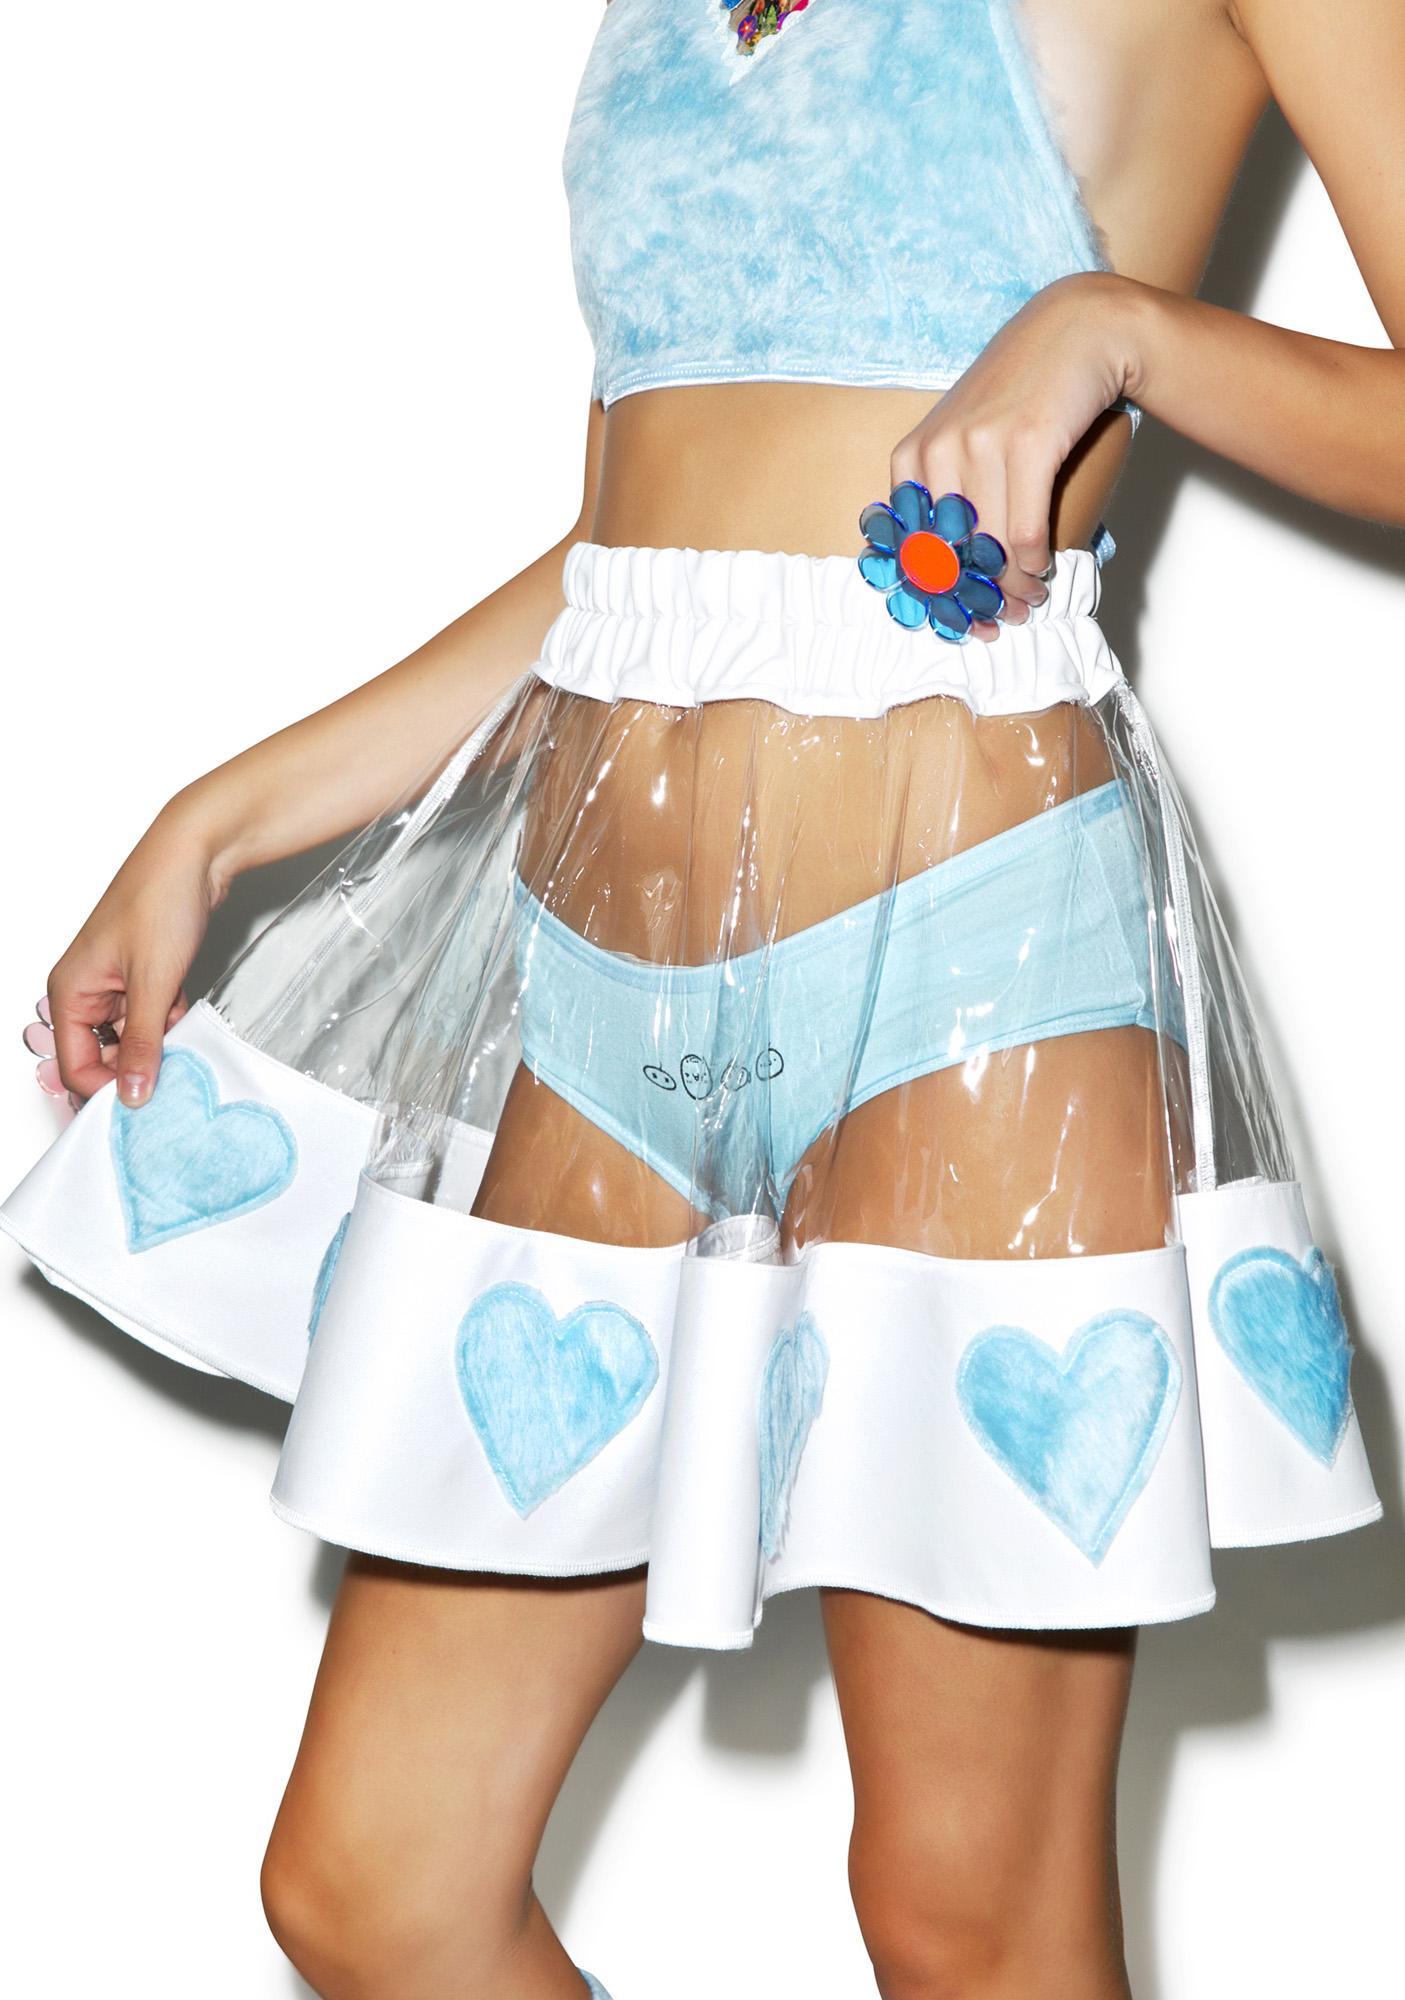 Indyanna Courtney Skies PVC Heart Skirt